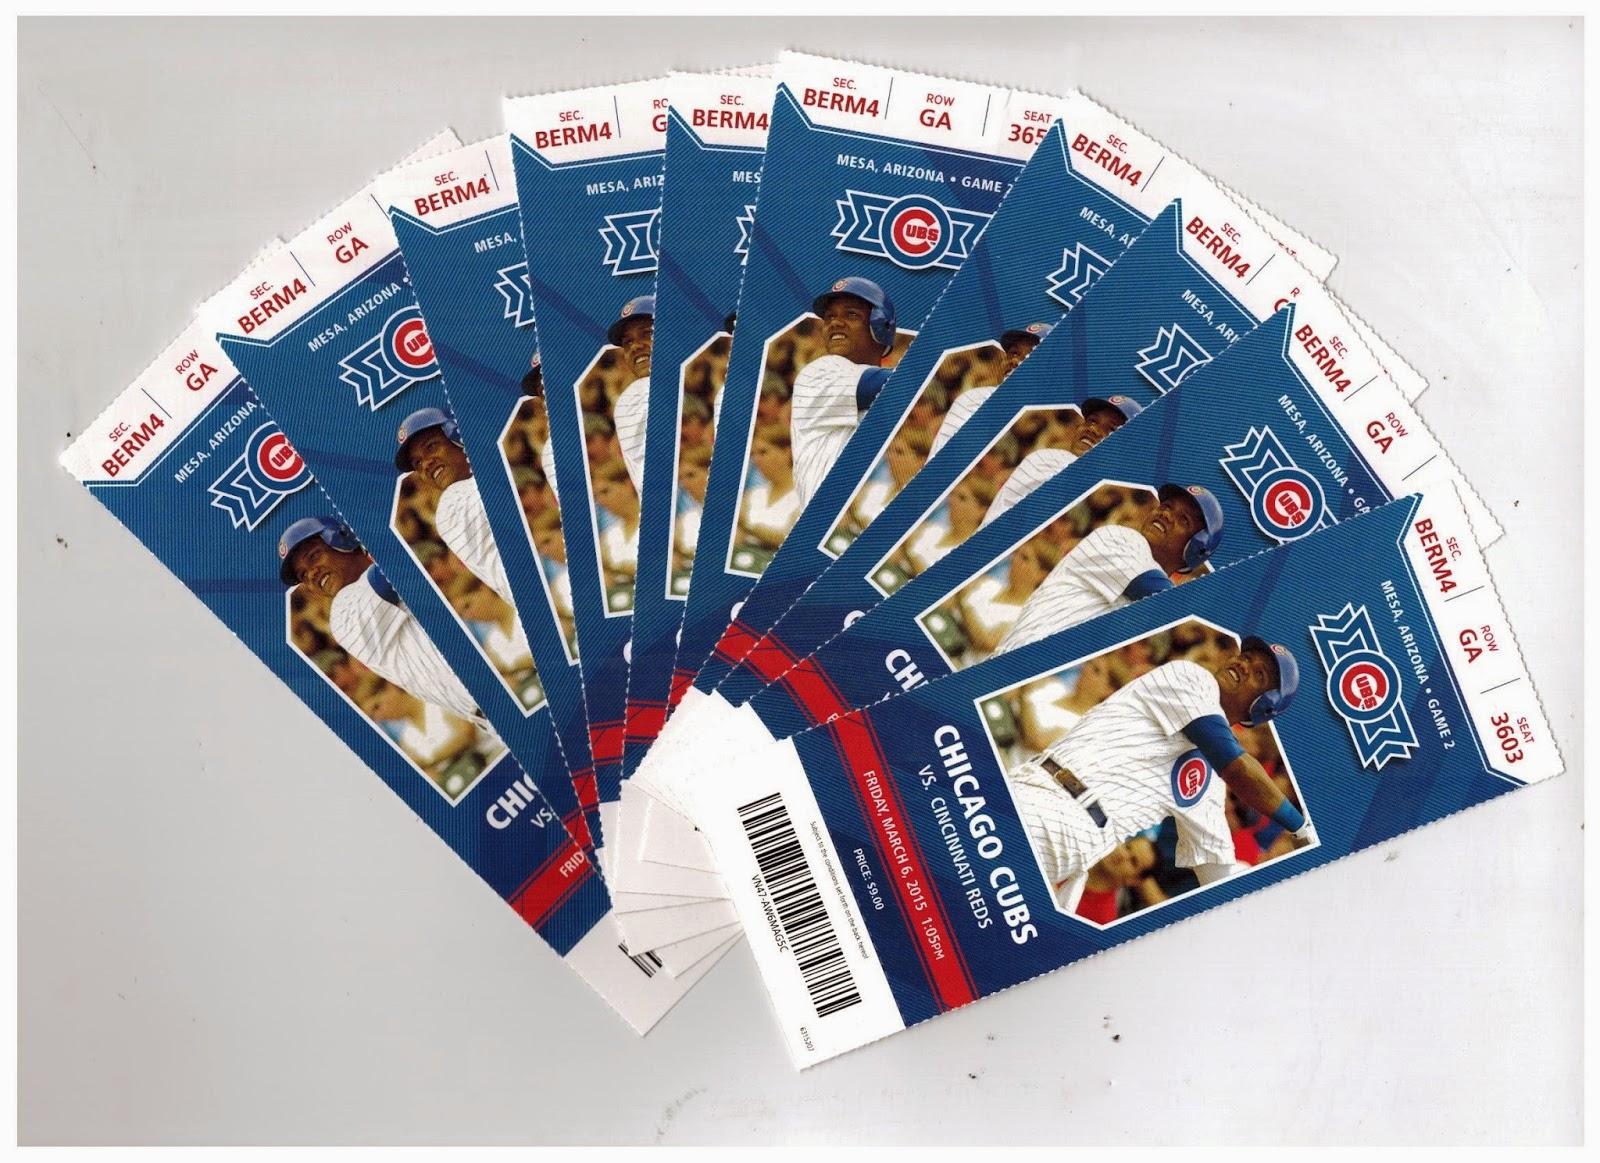 Enjoy Free Parking For Chicago Cubs Spring Training Games At Larry H Miller Nissan Mesa